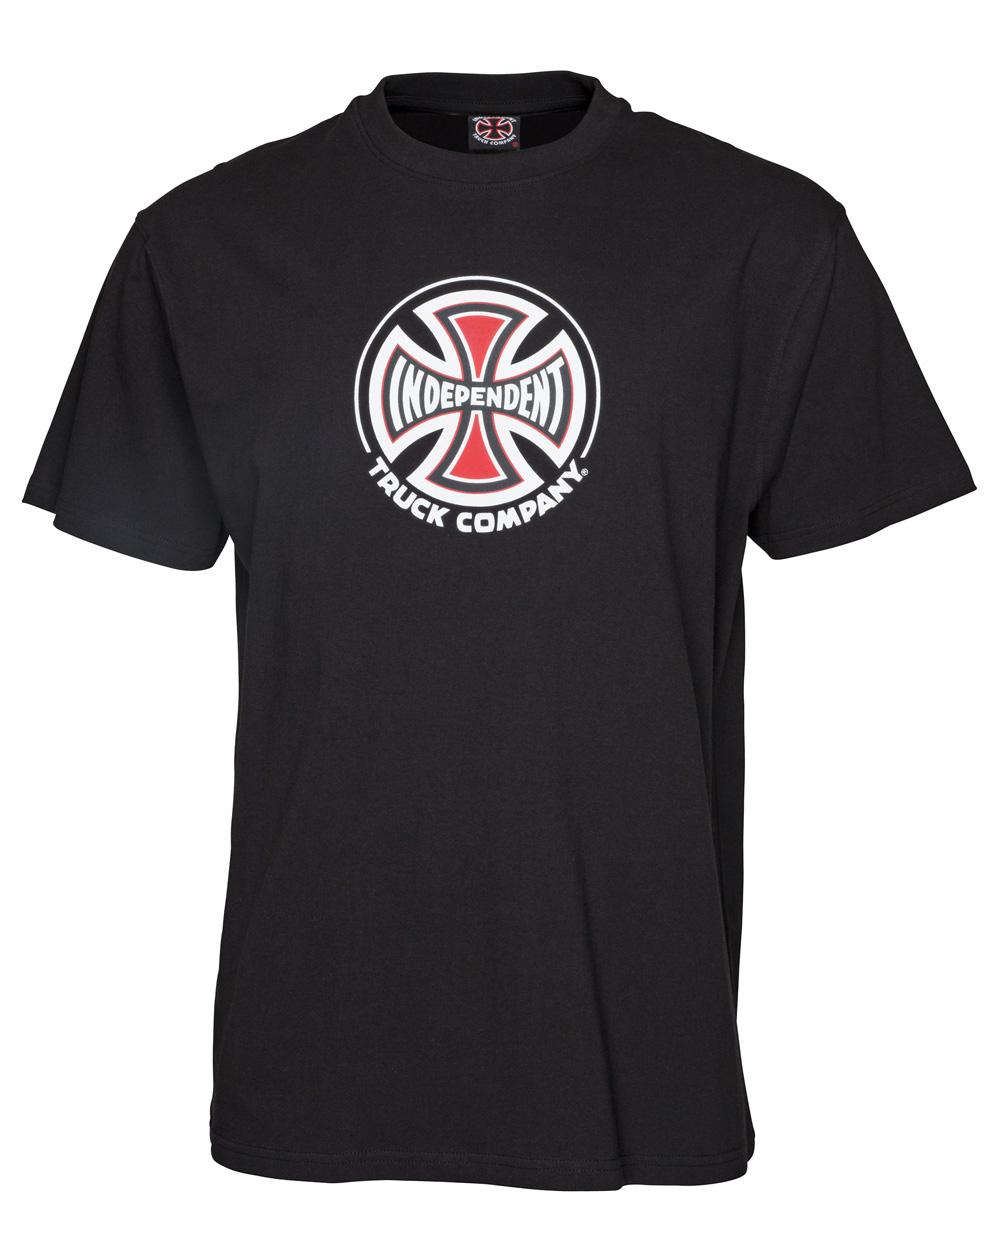 Independent Truck Co. Camiseta para Homem Black